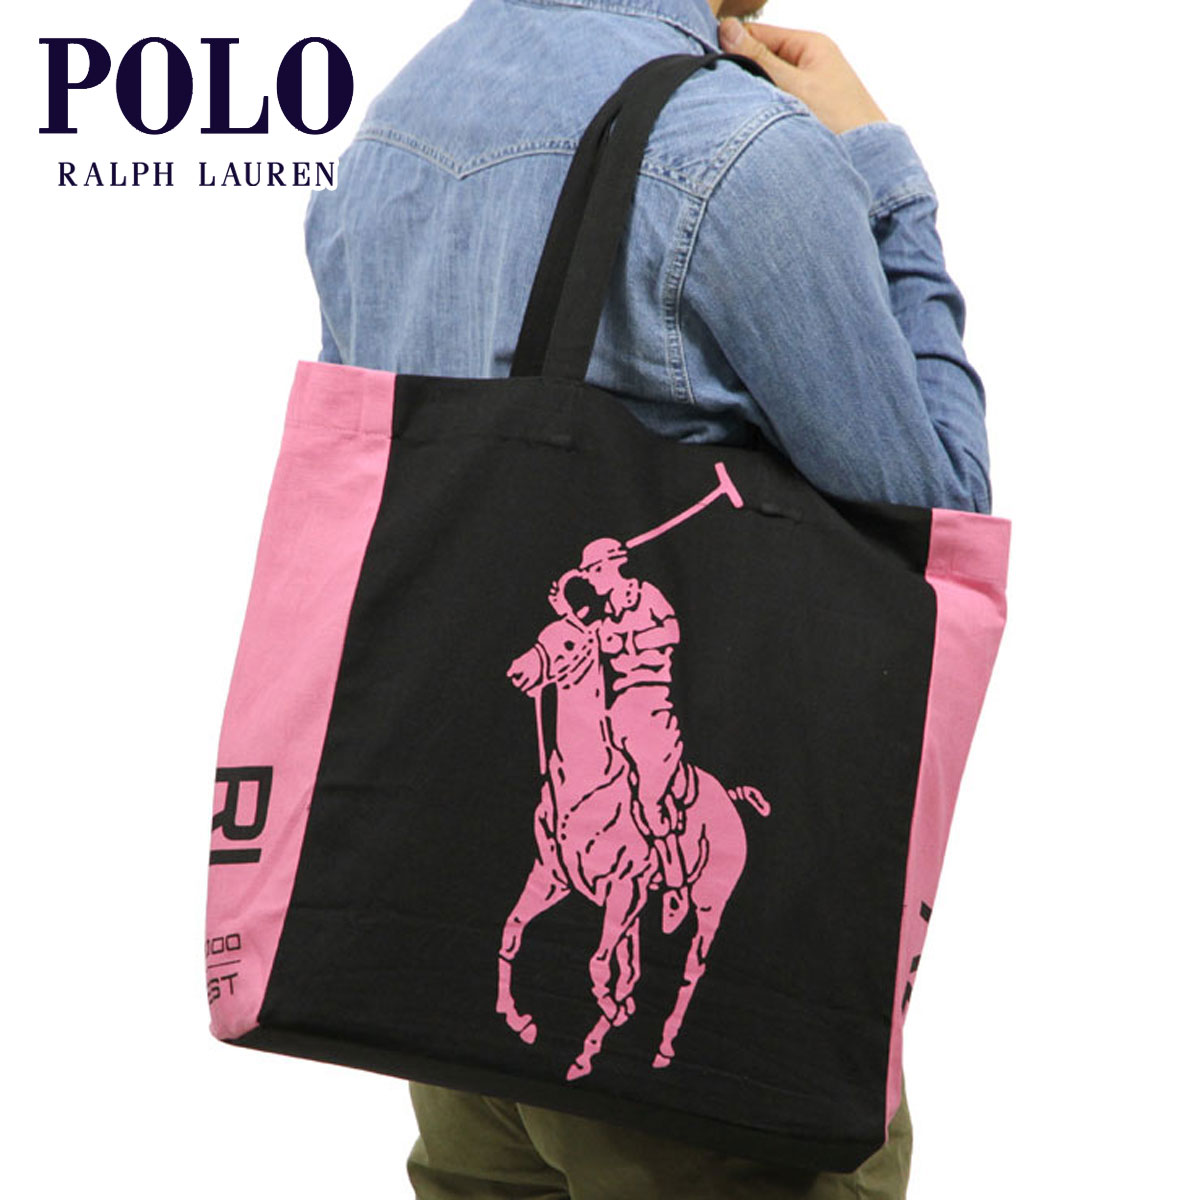 3353d93cbd Polo Ralph Lauren POLO RALPH LAUREN genuine tote bag PINK PONY TOTE BAG 38    42   13 cm BLACK P14Nov15